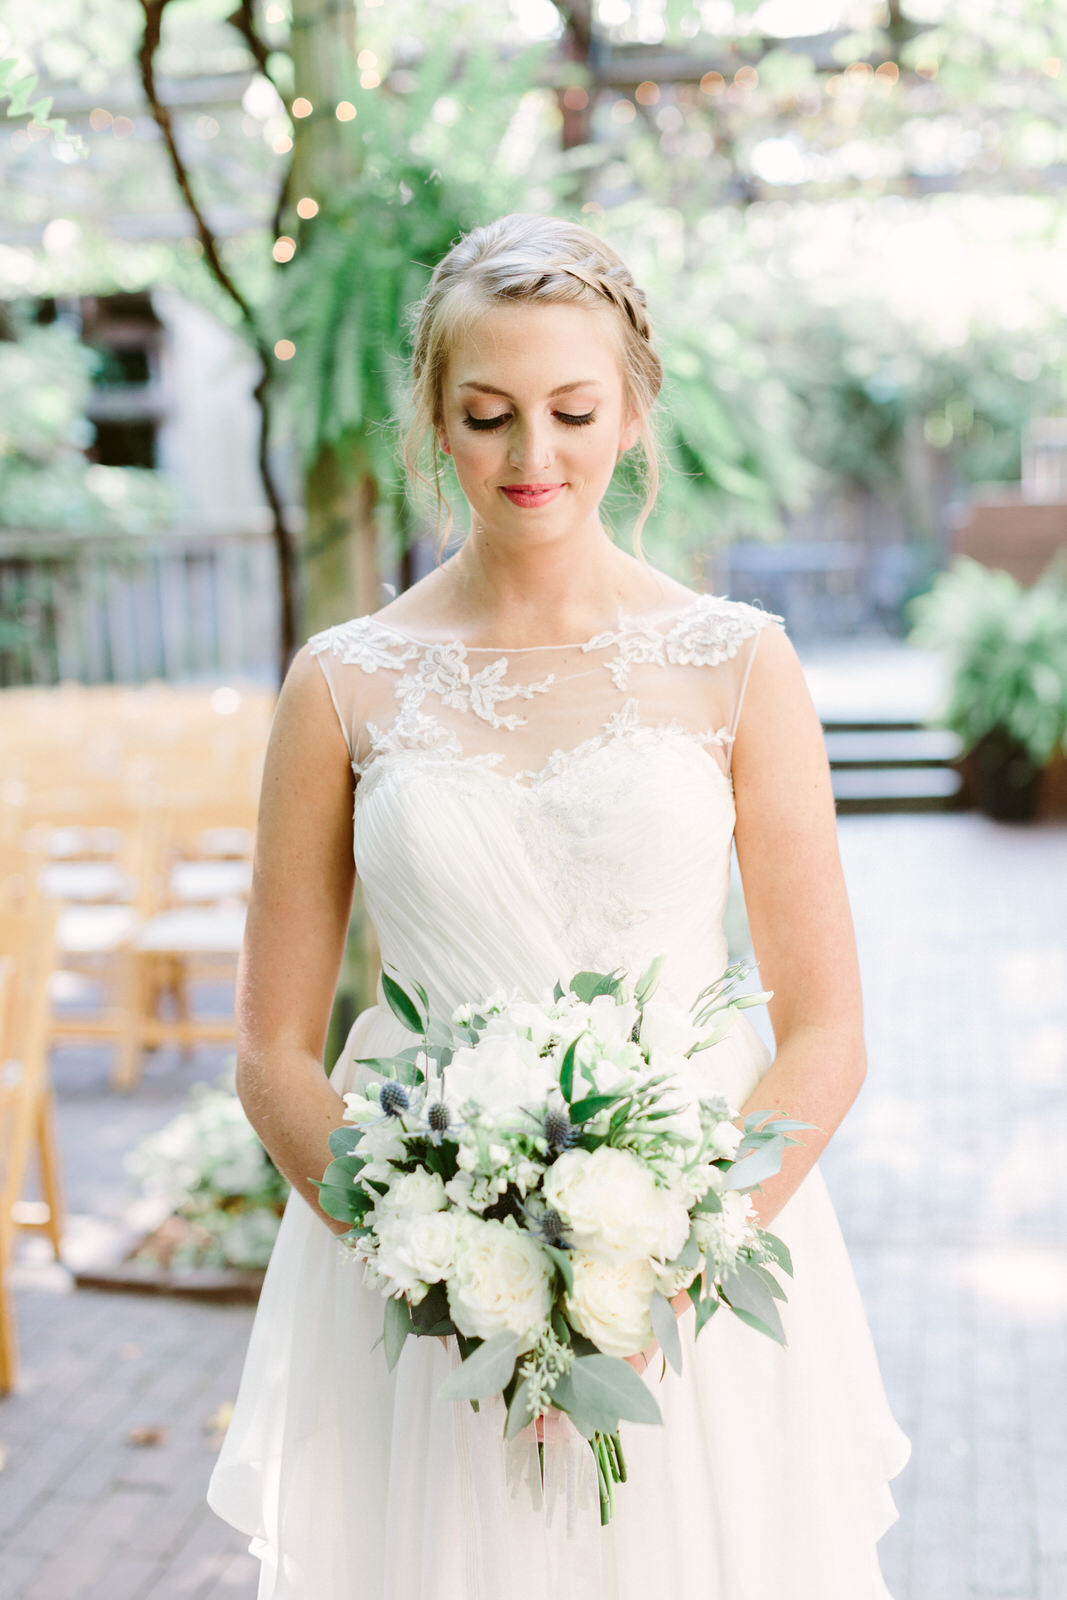 KatiMallory-Fayetteville Wedding Florist-2011.JPG